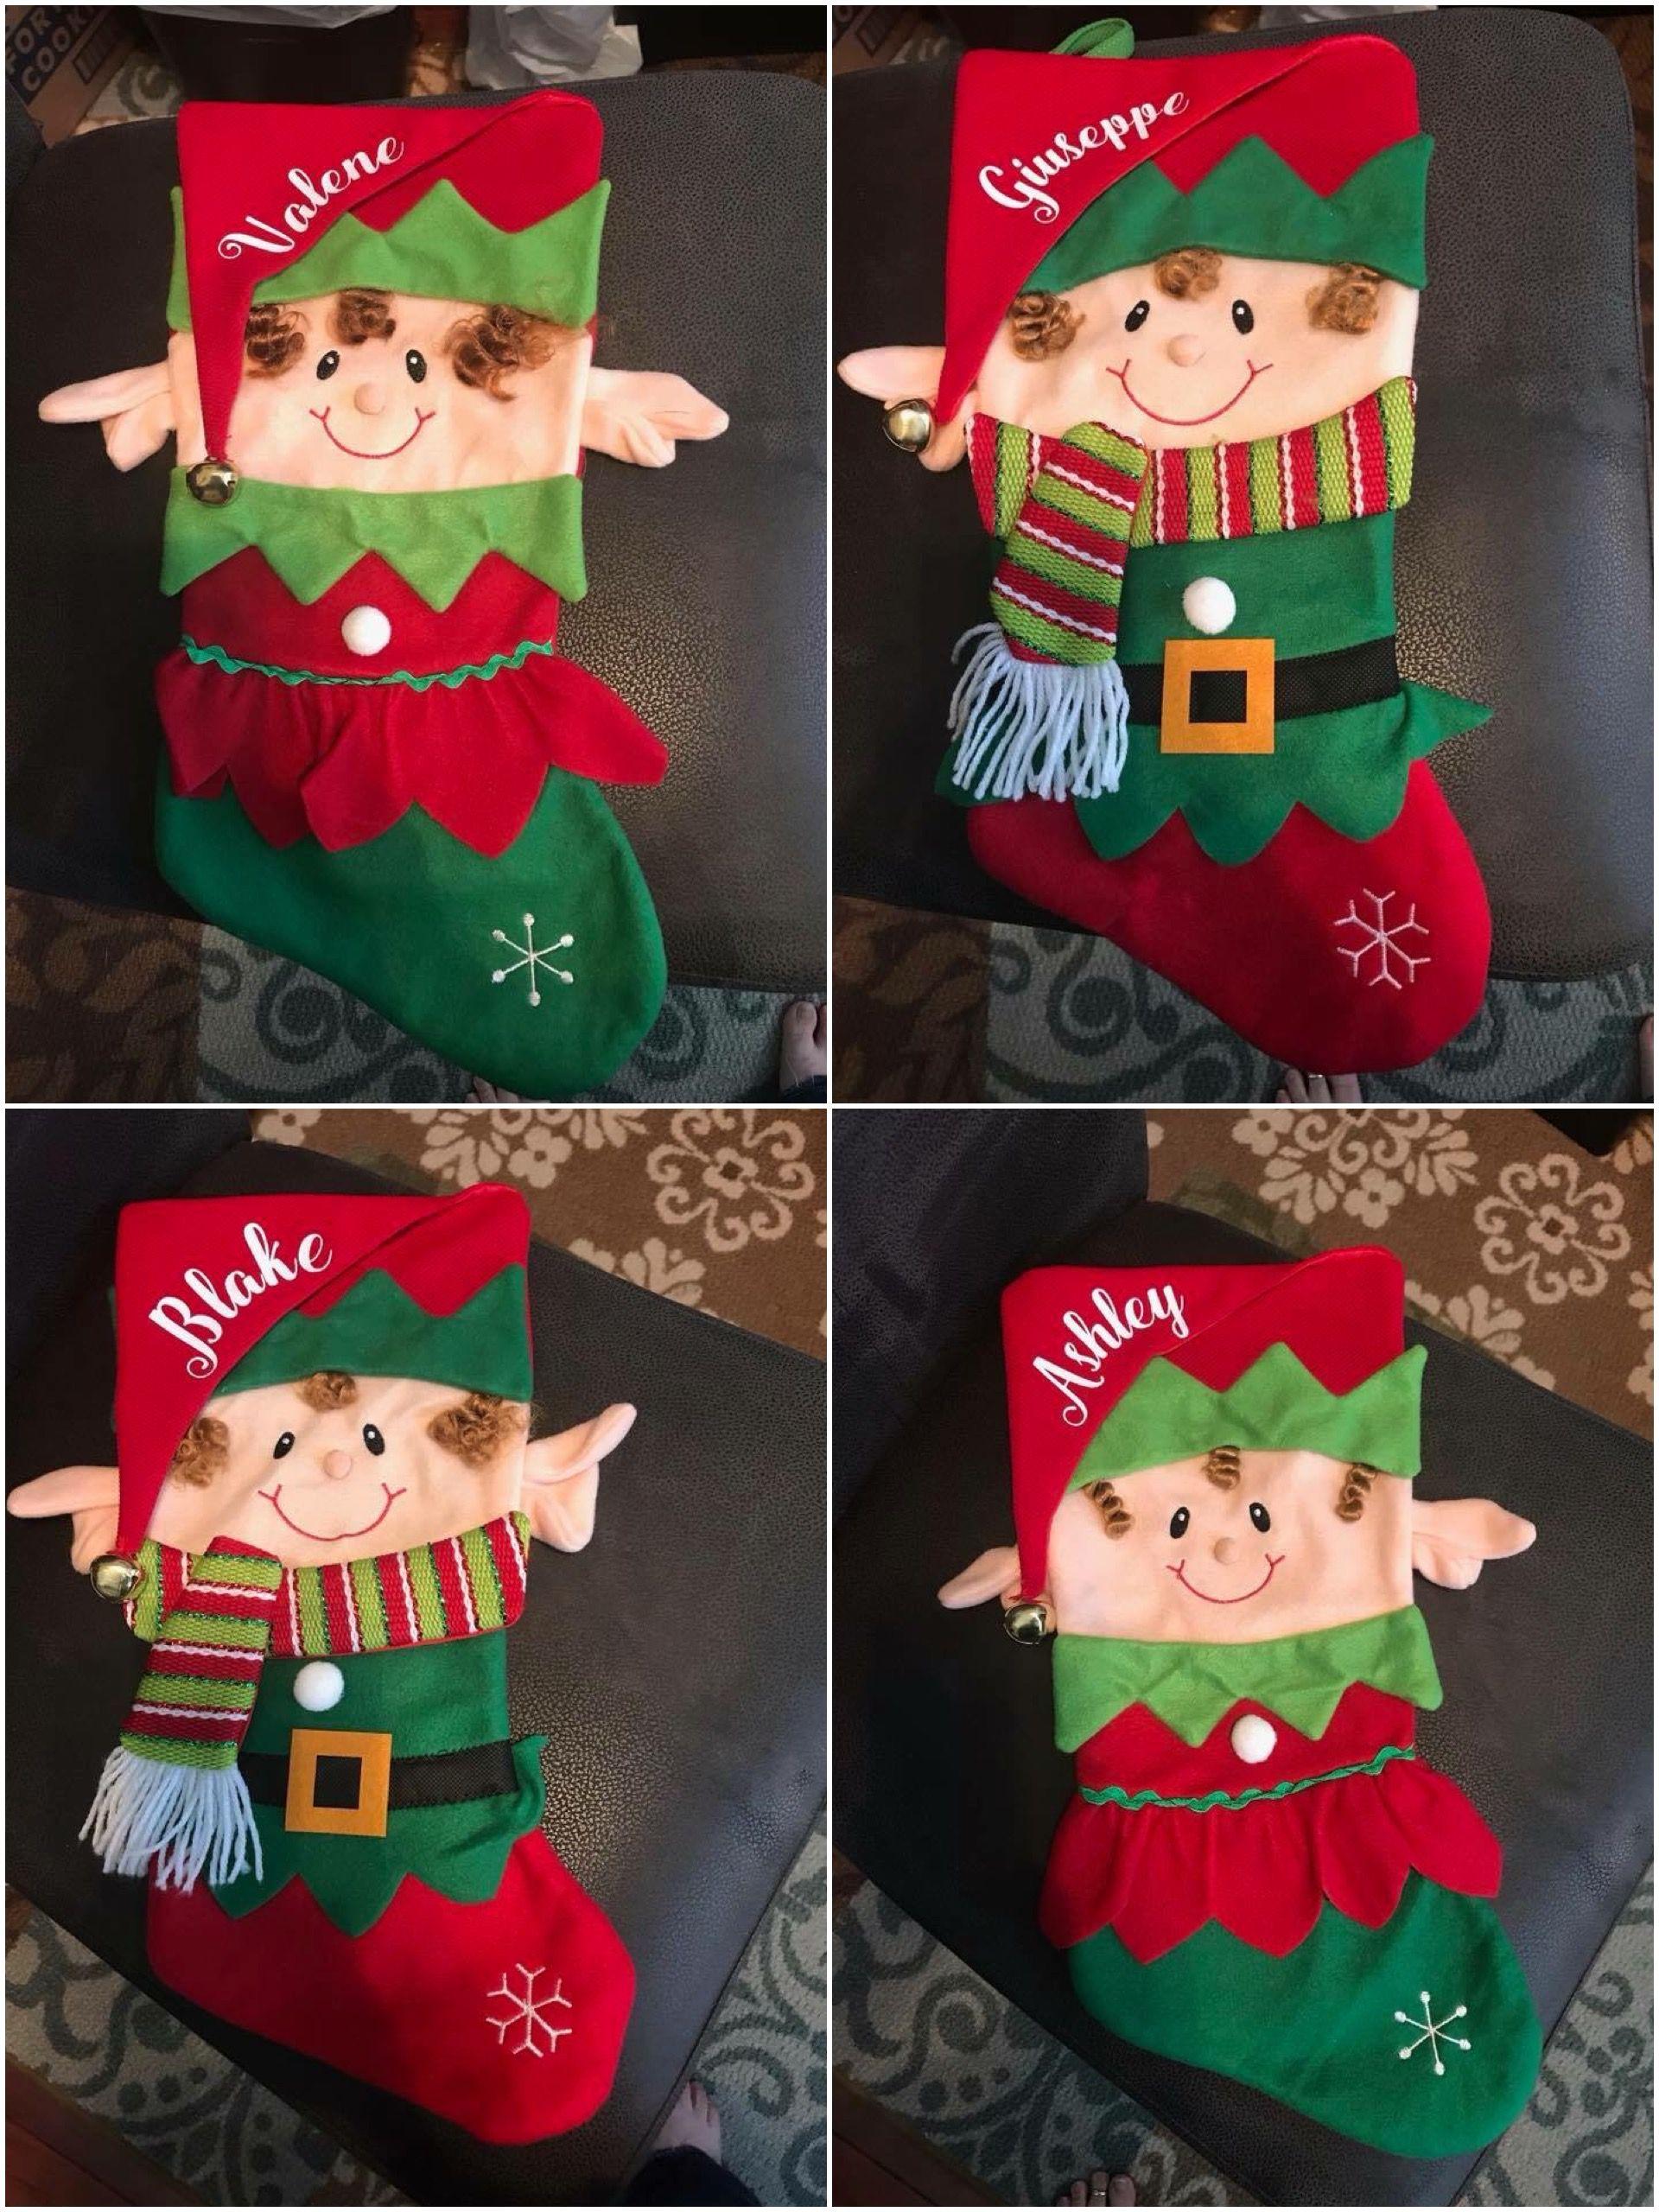 christmas stocking from hobby lobby personalized for family - Hobby Lobby Christmas Stockings